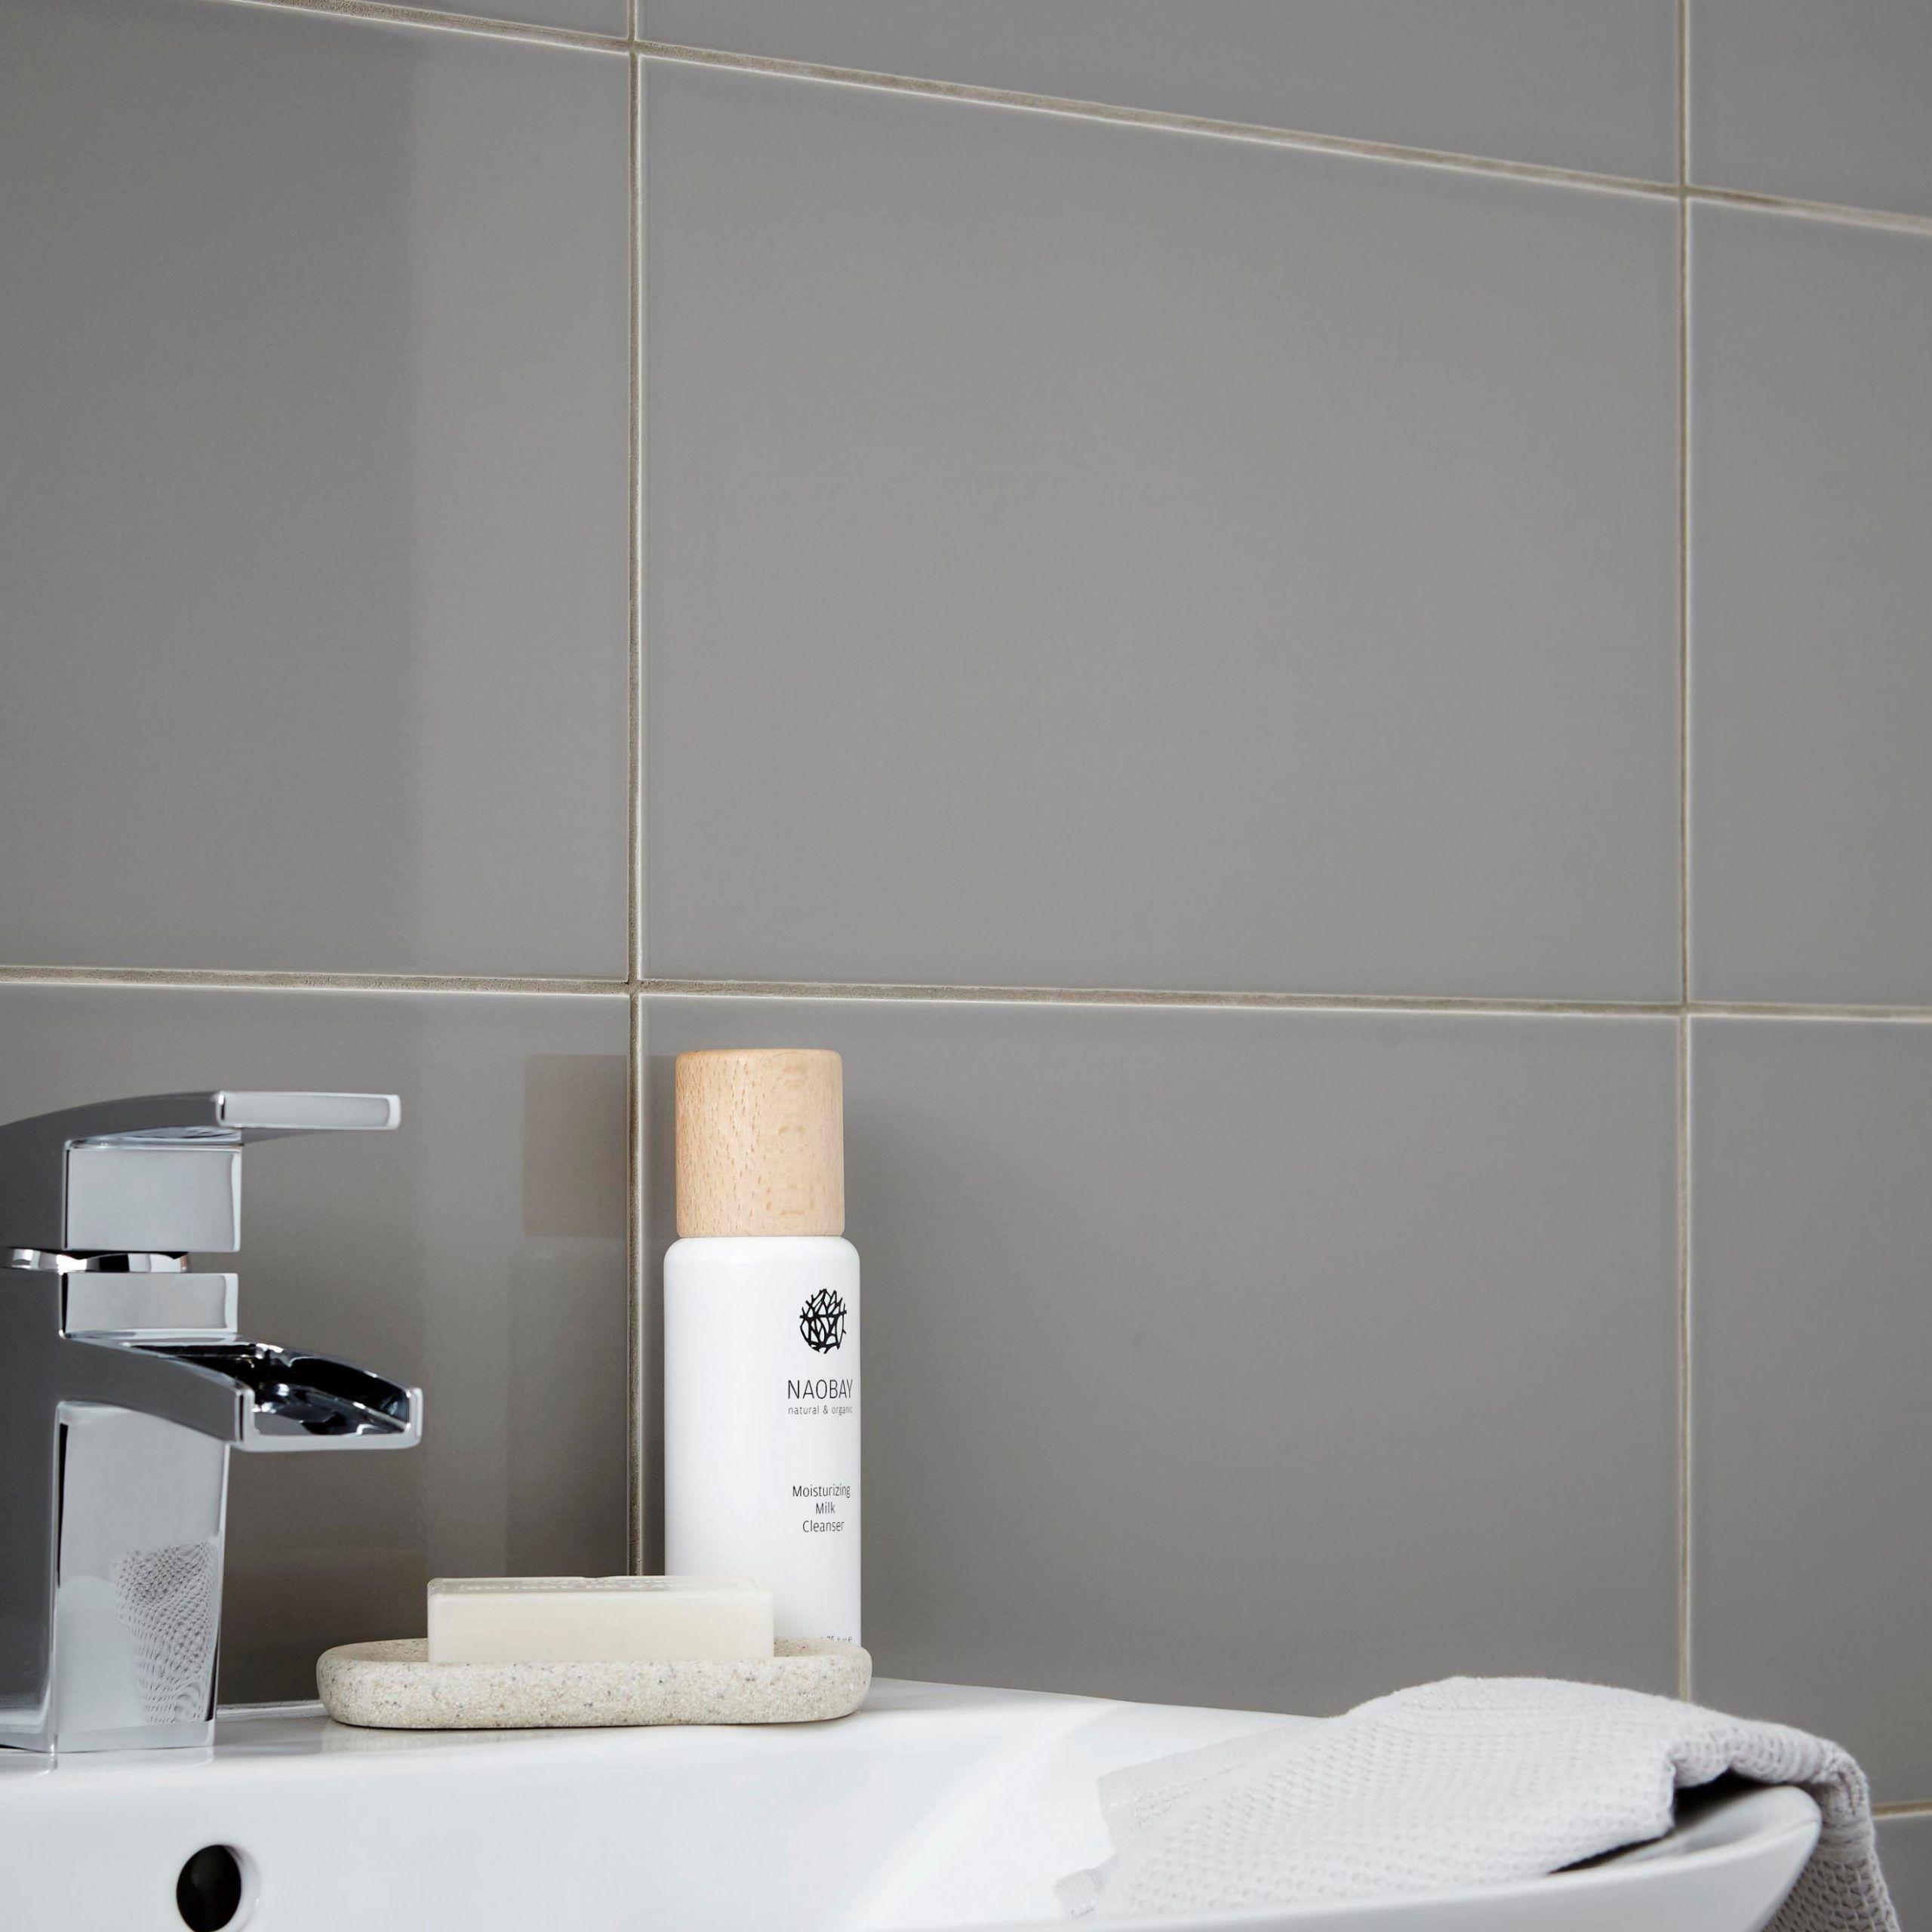 Bathroom Wall Panels B And Di 2020 Dengan Gambar